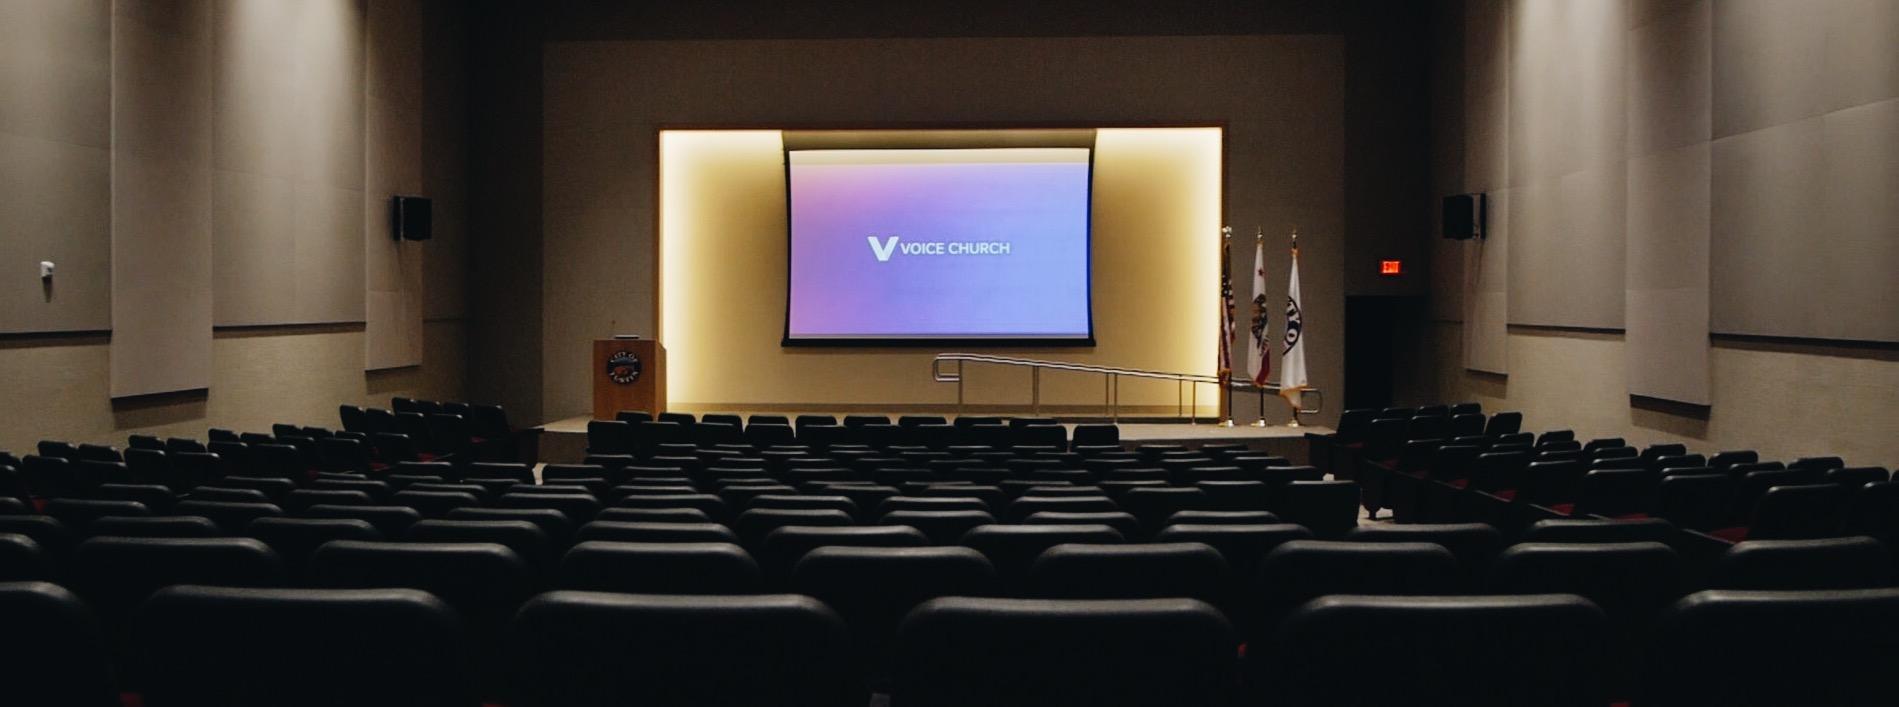 Voice Church - Tustin, CA 92782 - (949)438-6423 | ShowMeLocal.com